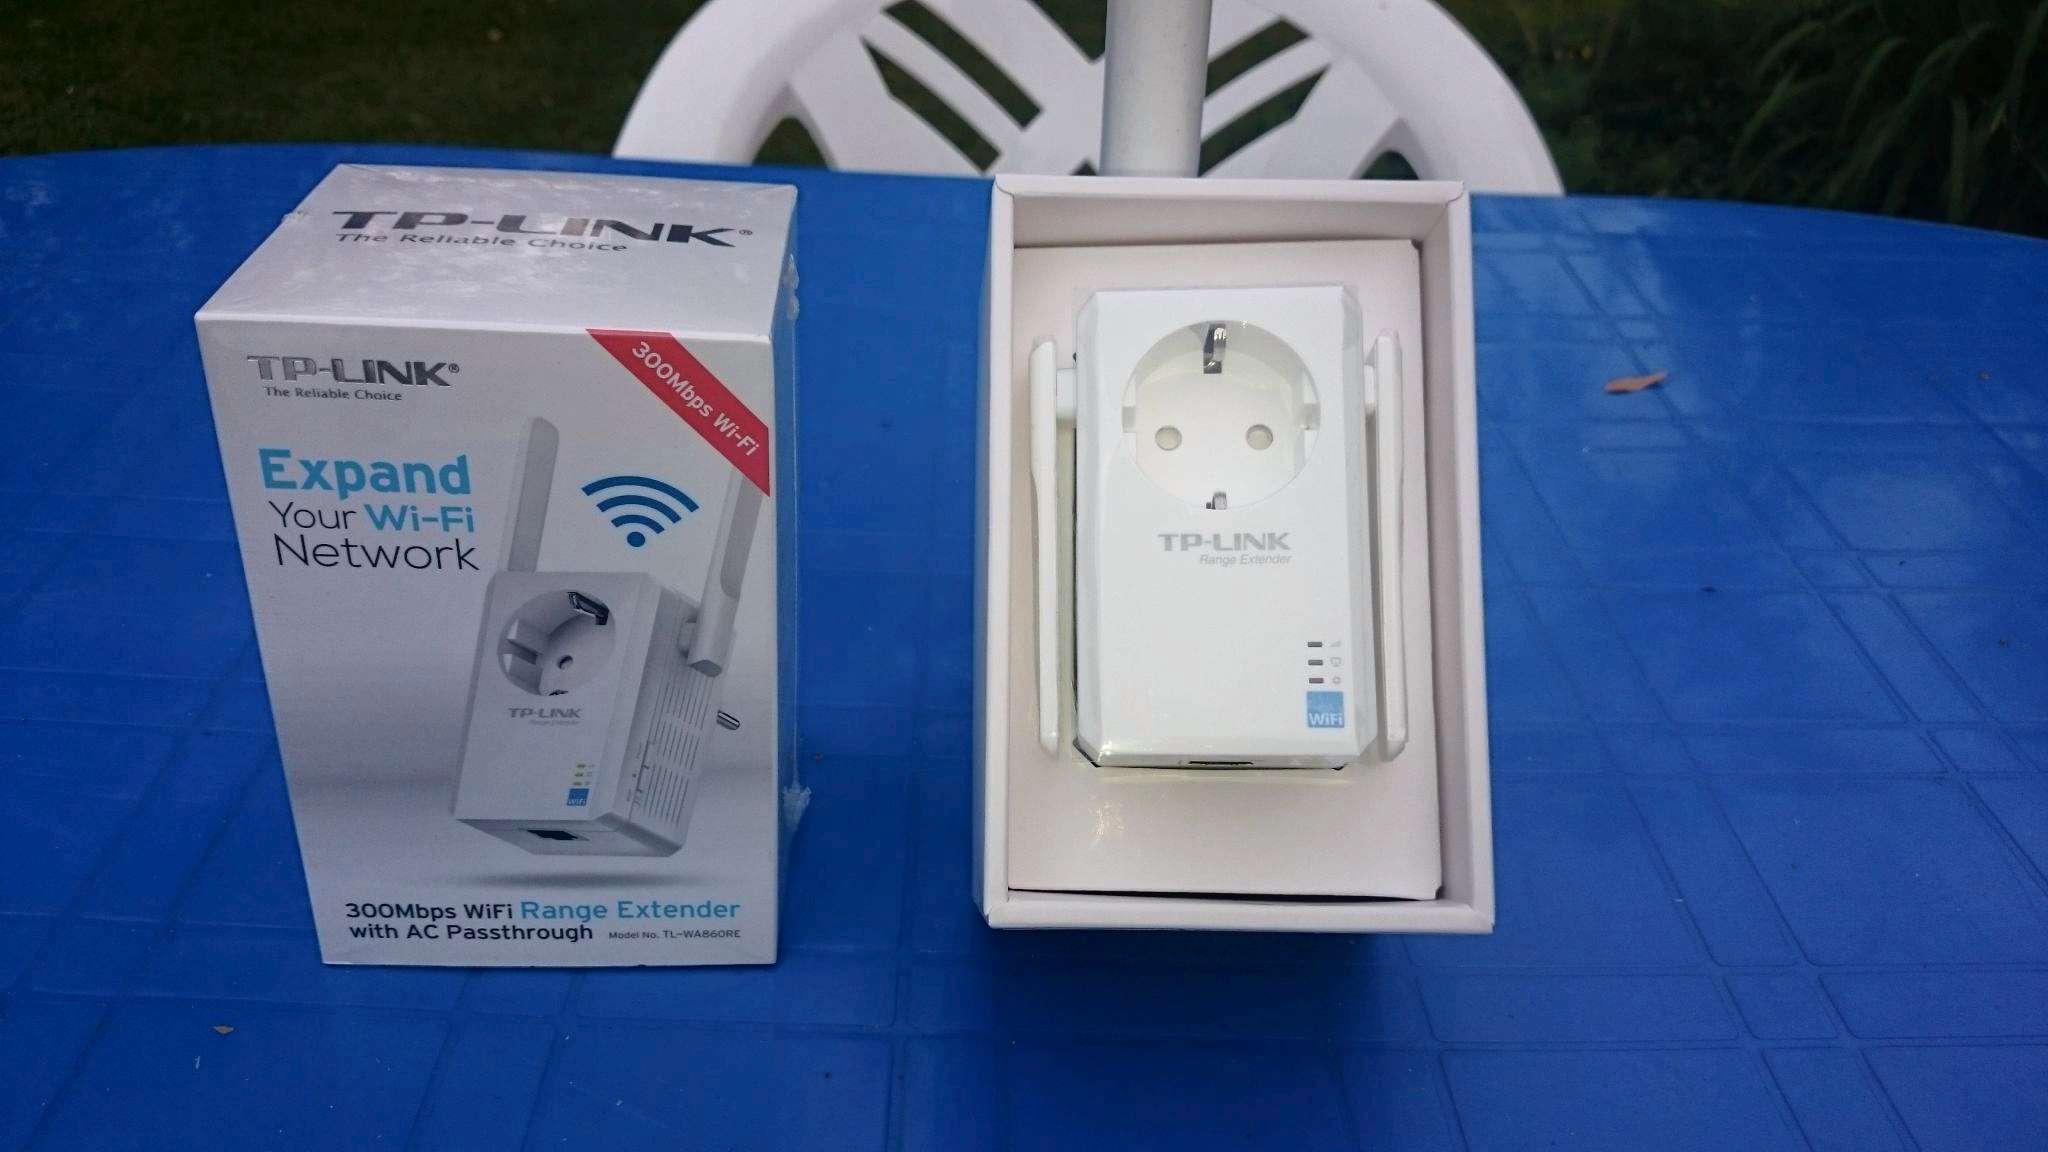 Wi Fi Tp Link Tl Wa860re 80211n 24ghz 300 Mbps 300mbps Wifi Range Extender With Ac Passthrough Povtoritel 1468139428 1